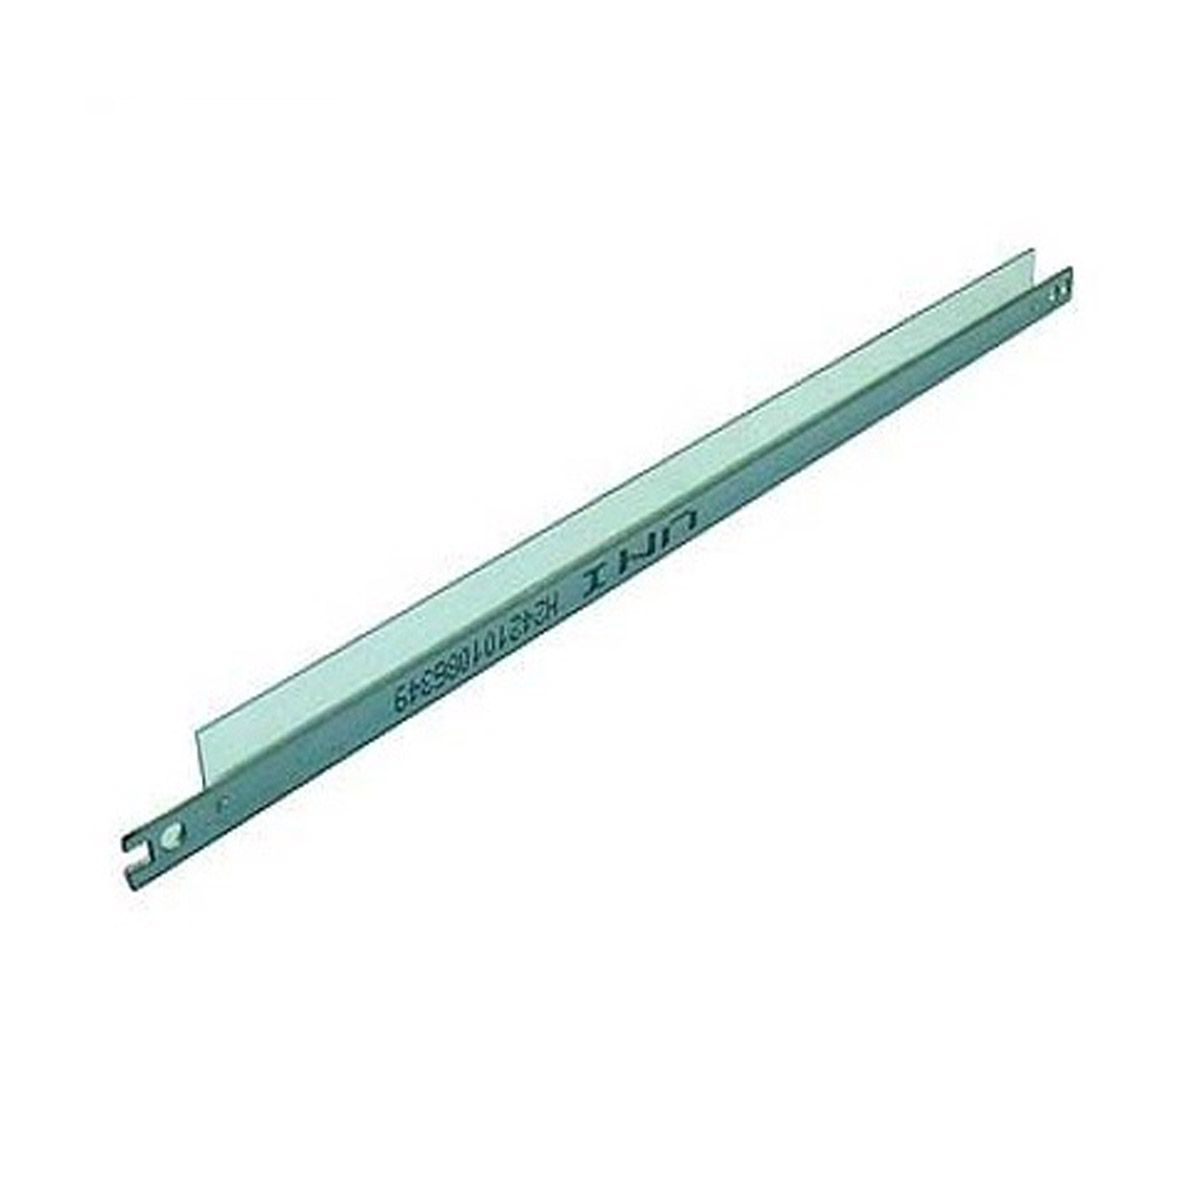 Lamina Dosadora Doctor Blade HP Q2612A Q2612 2612 12A - 1018 1020 M1005